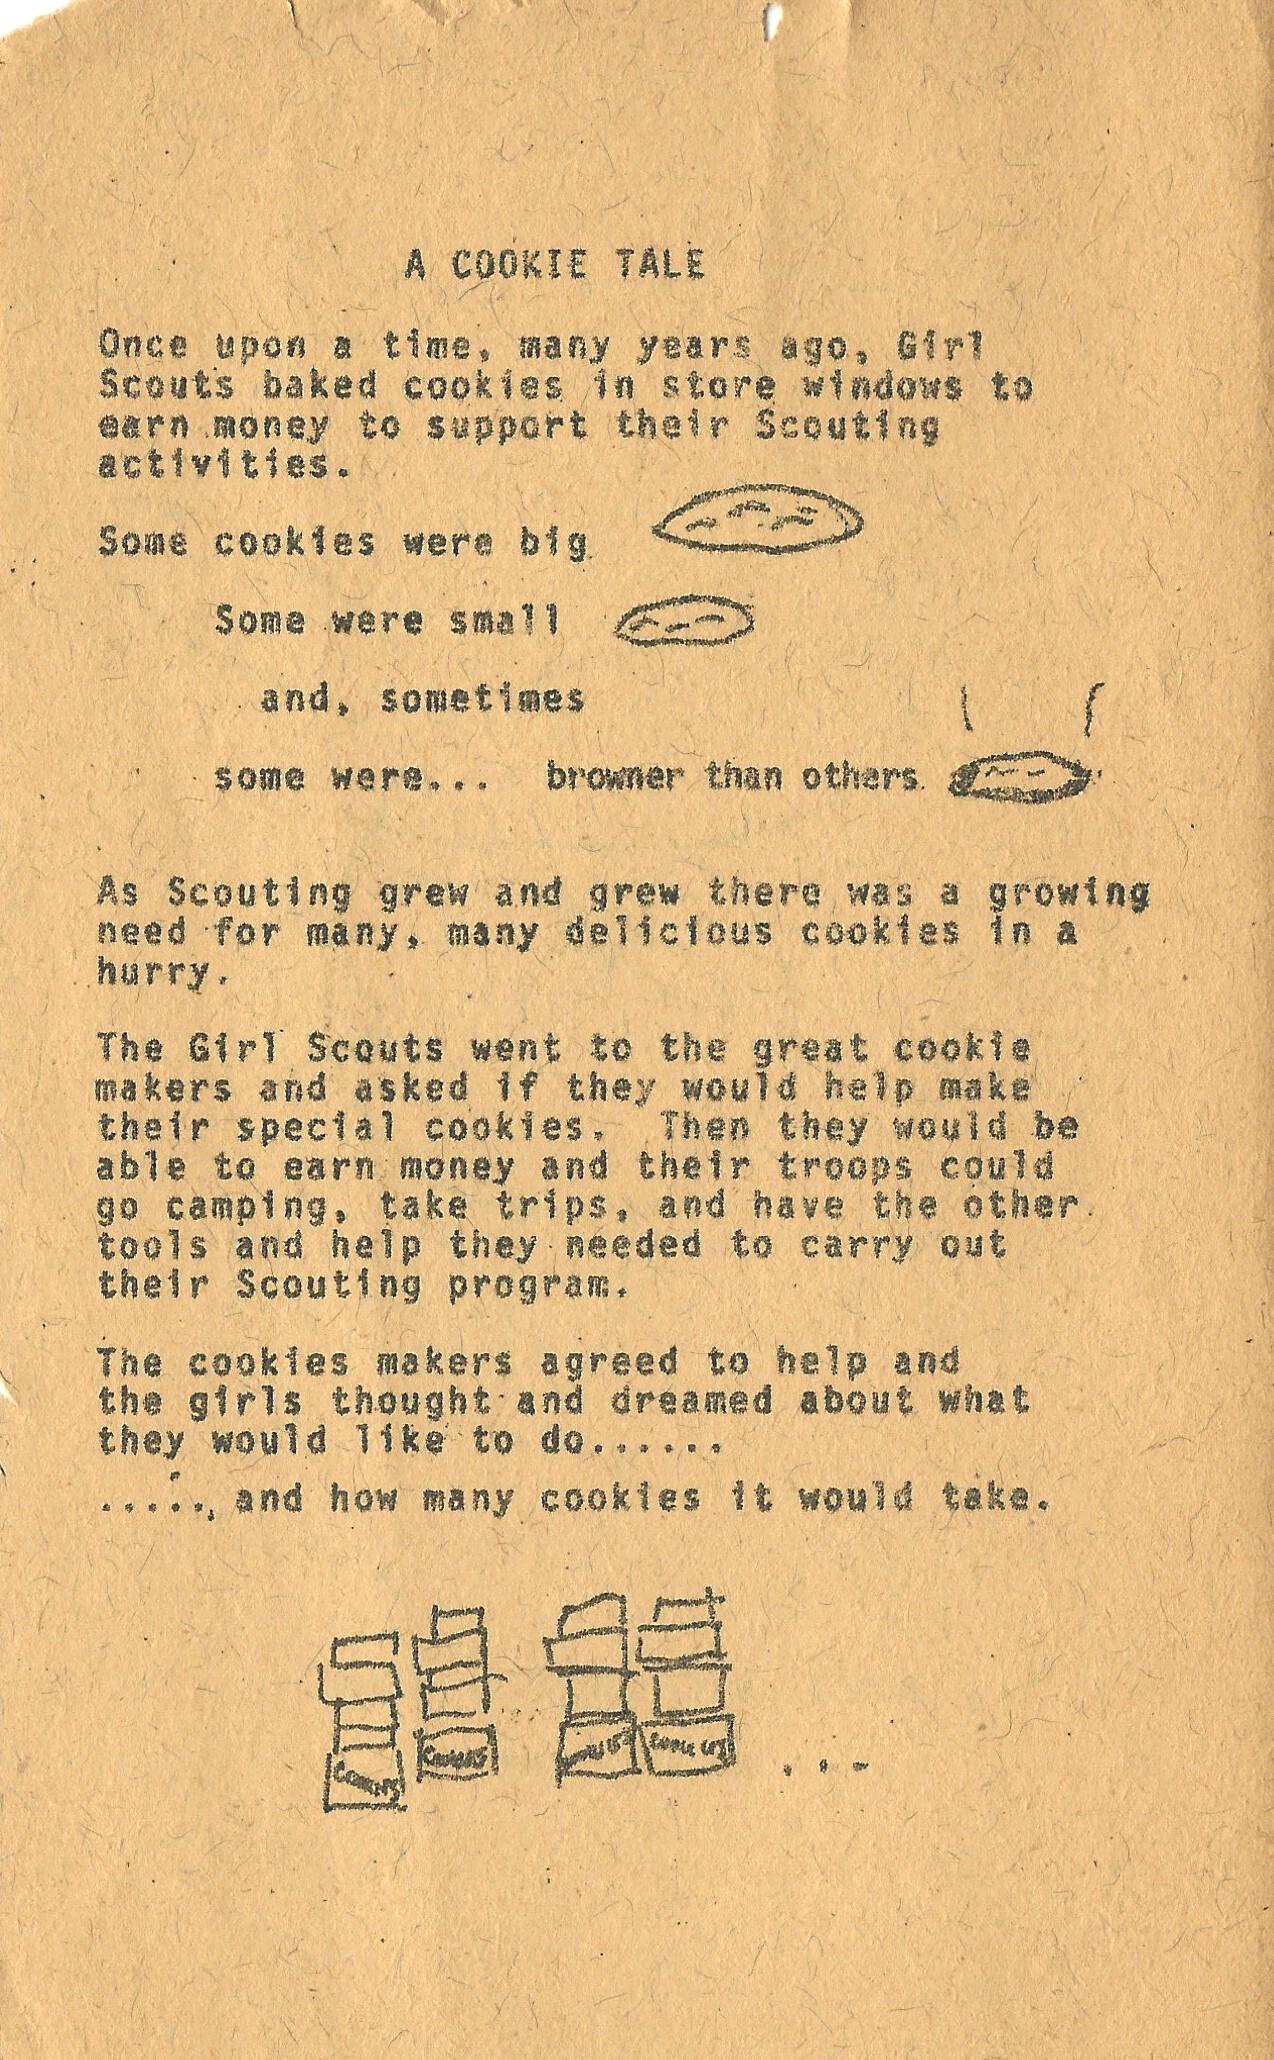 aardvark-tale-1